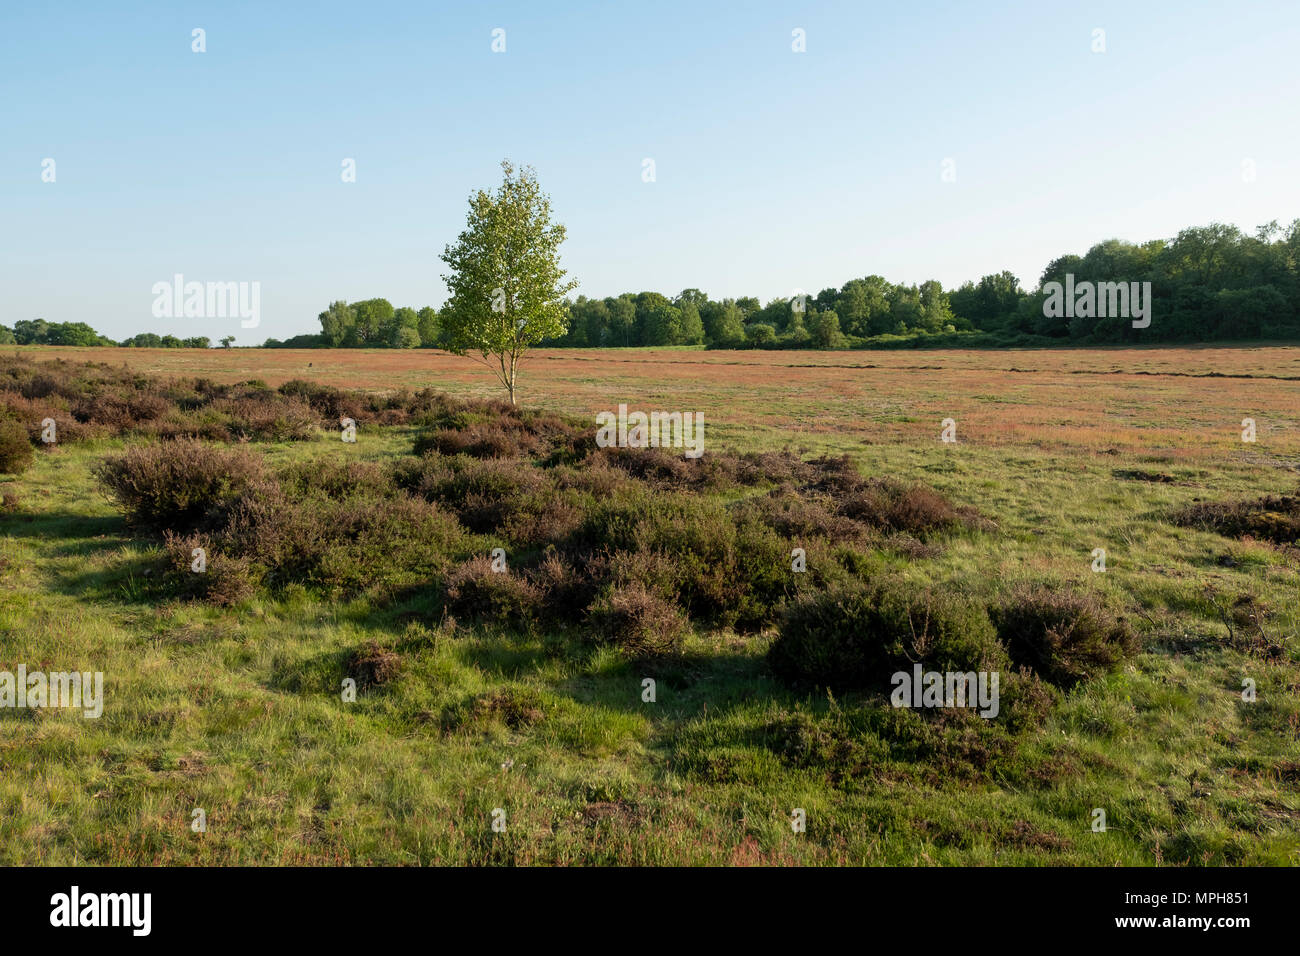 Krefeld-Traar, Egelsberg, Heidelandschaft mit blühendem Flohknöterich - Stock Image